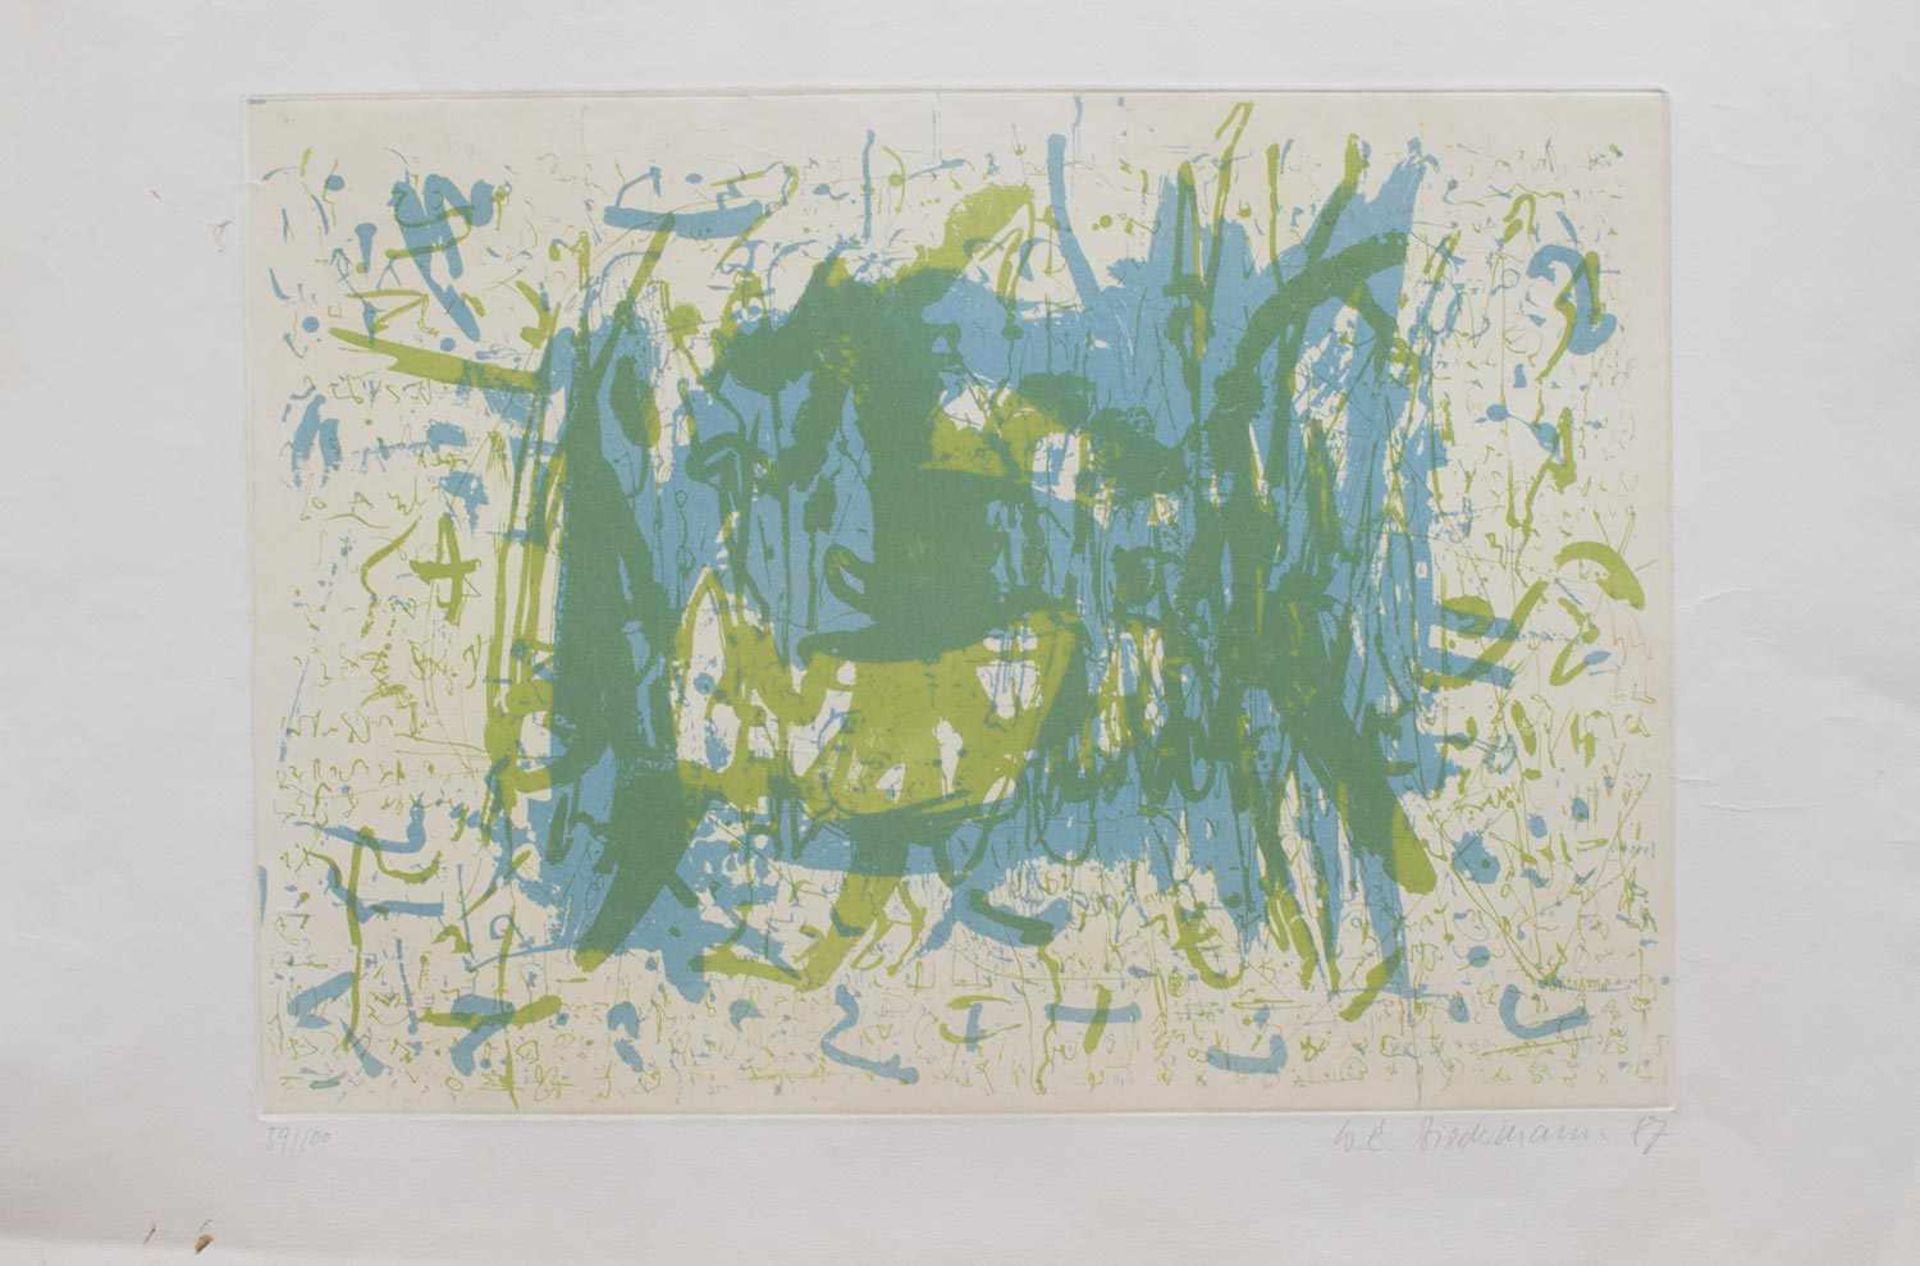 Los 6 - Wolgang E. Biedermann (Plauen 1940 - 2008 Leipzig, deutscher Maler u. Grafiker, Std. a.d. HS f.